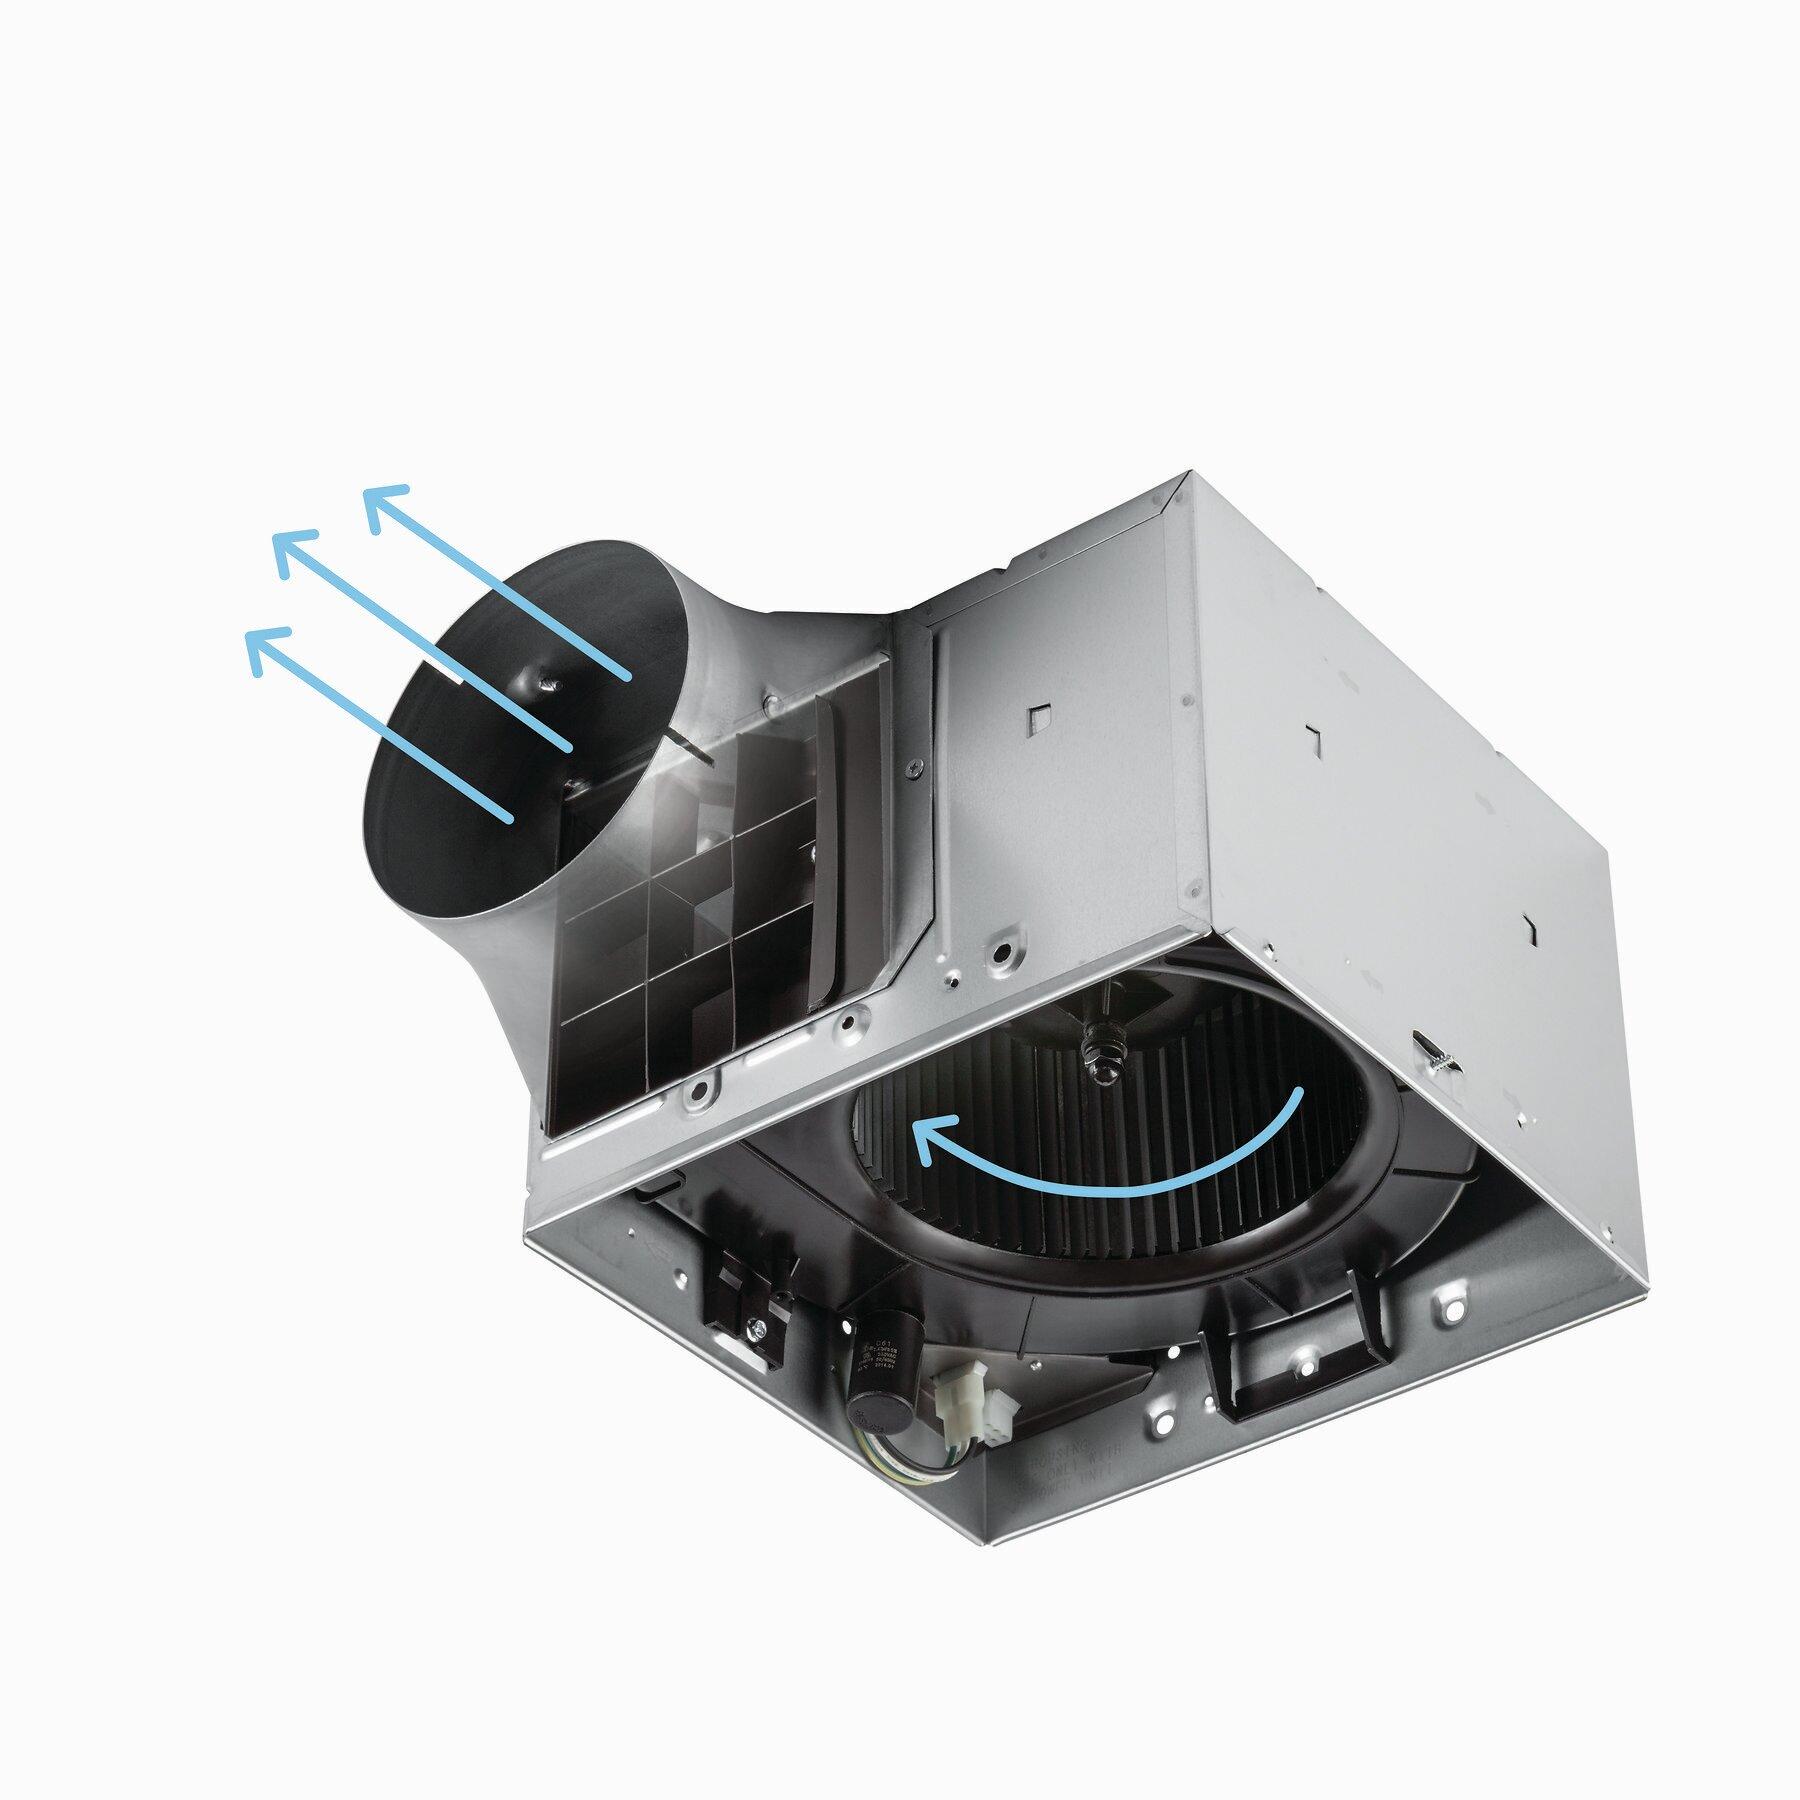 Broan Ultra Pro 110 Cfm Energy Star Bathroom Fan With Night Light Reviews Wayfair